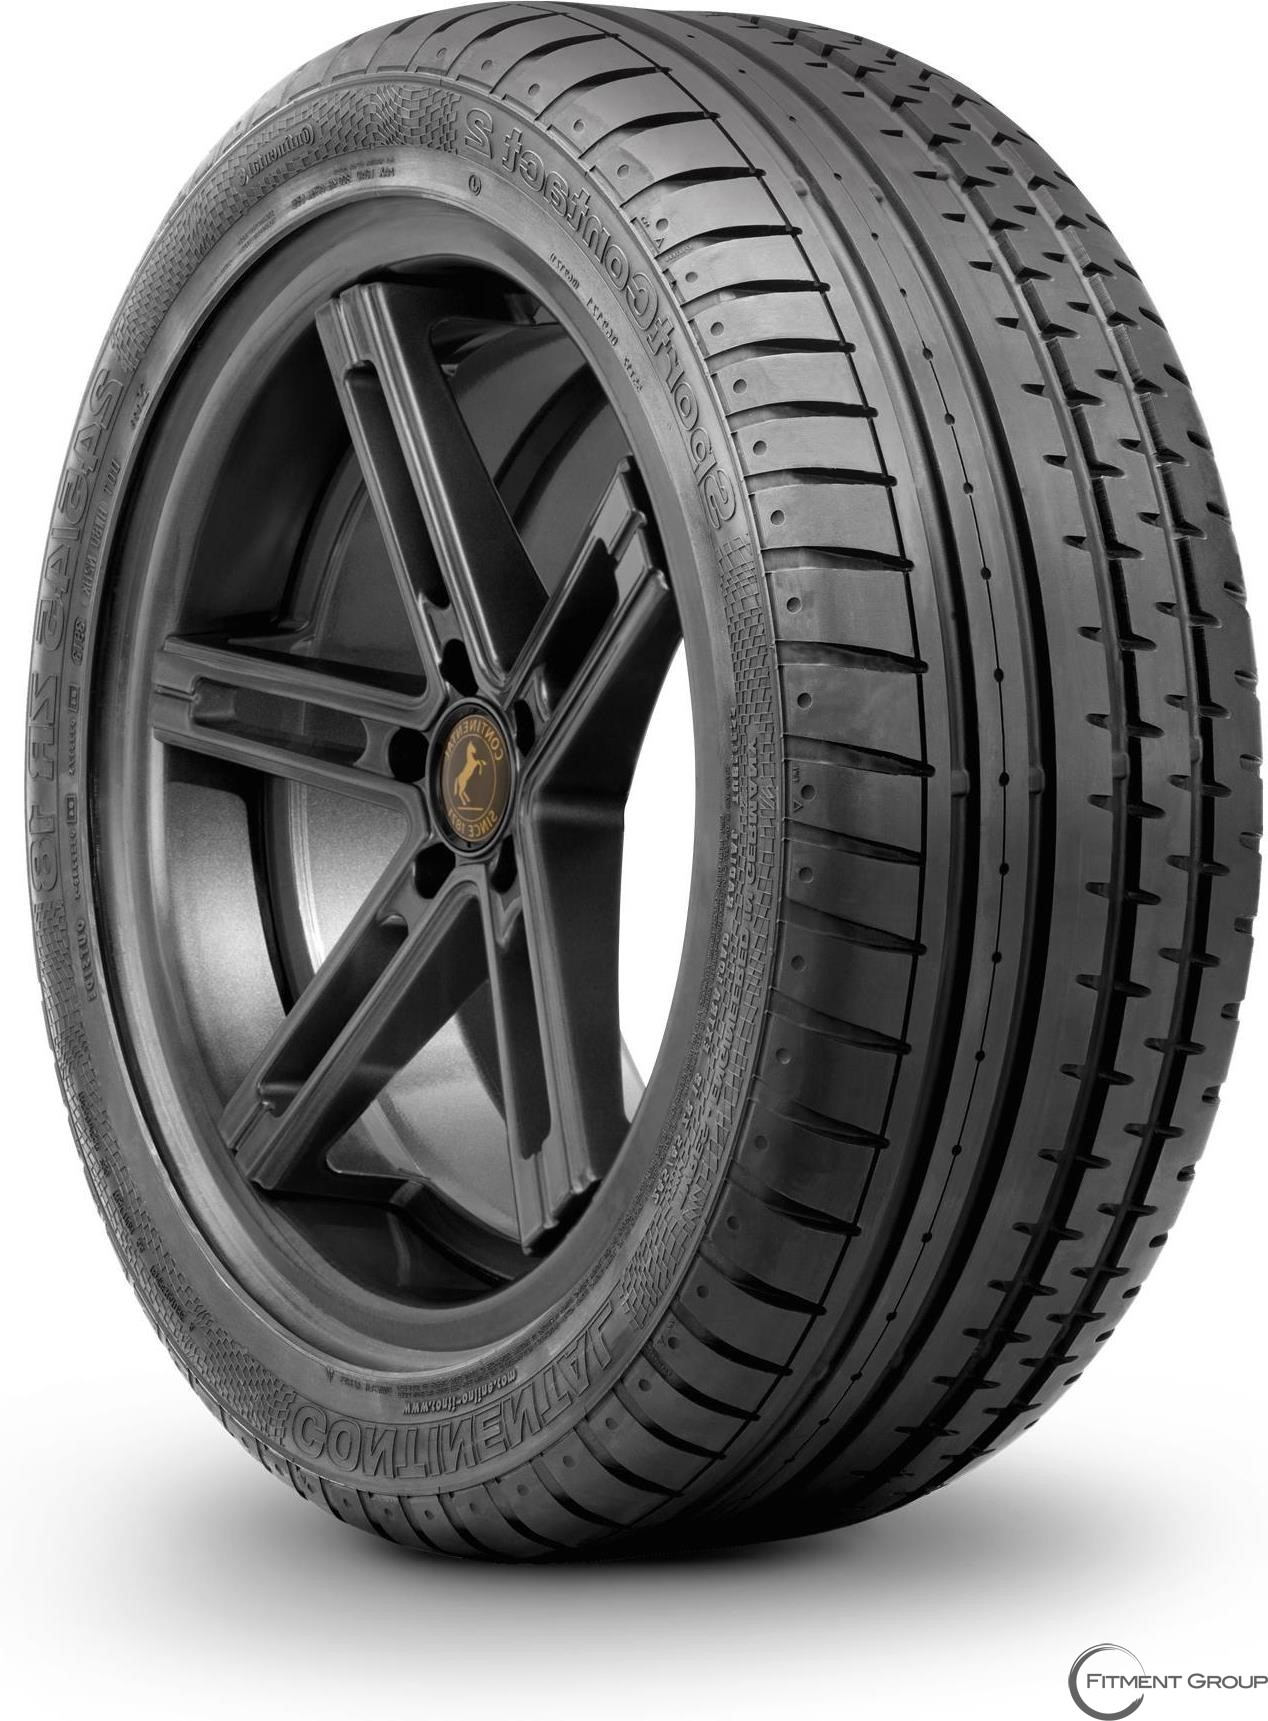 continental big brand tire service has a large. Black Bedroom Furniture Sets. Home Design Ideas